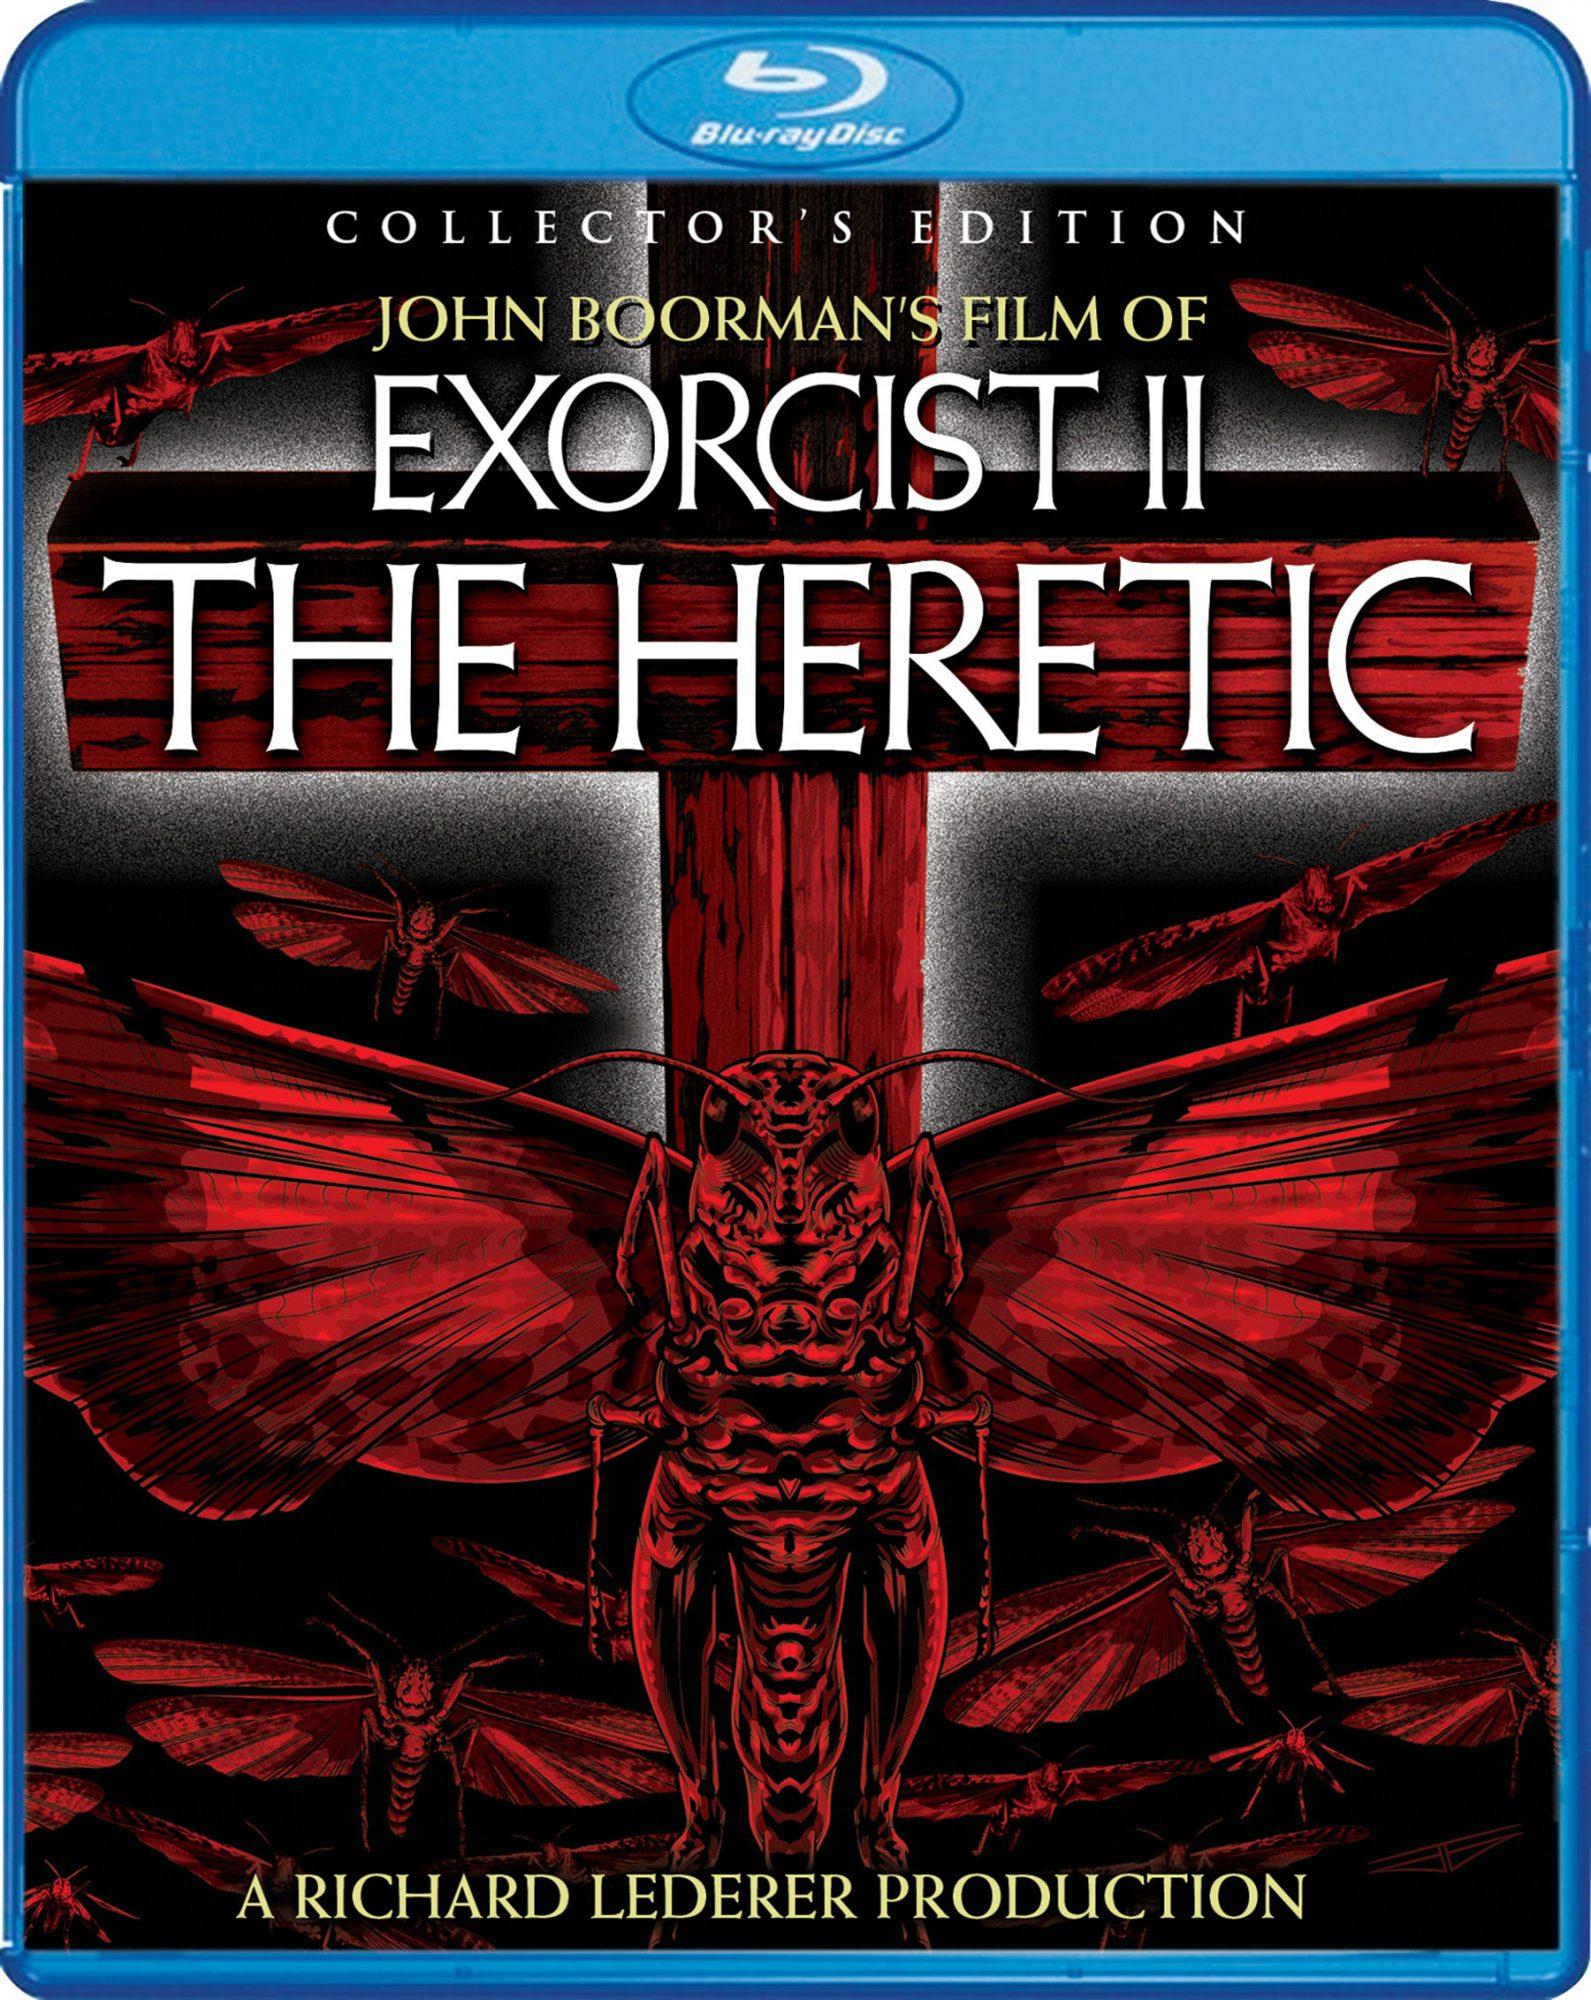 Exorcist2.BR.Cover.300dpi